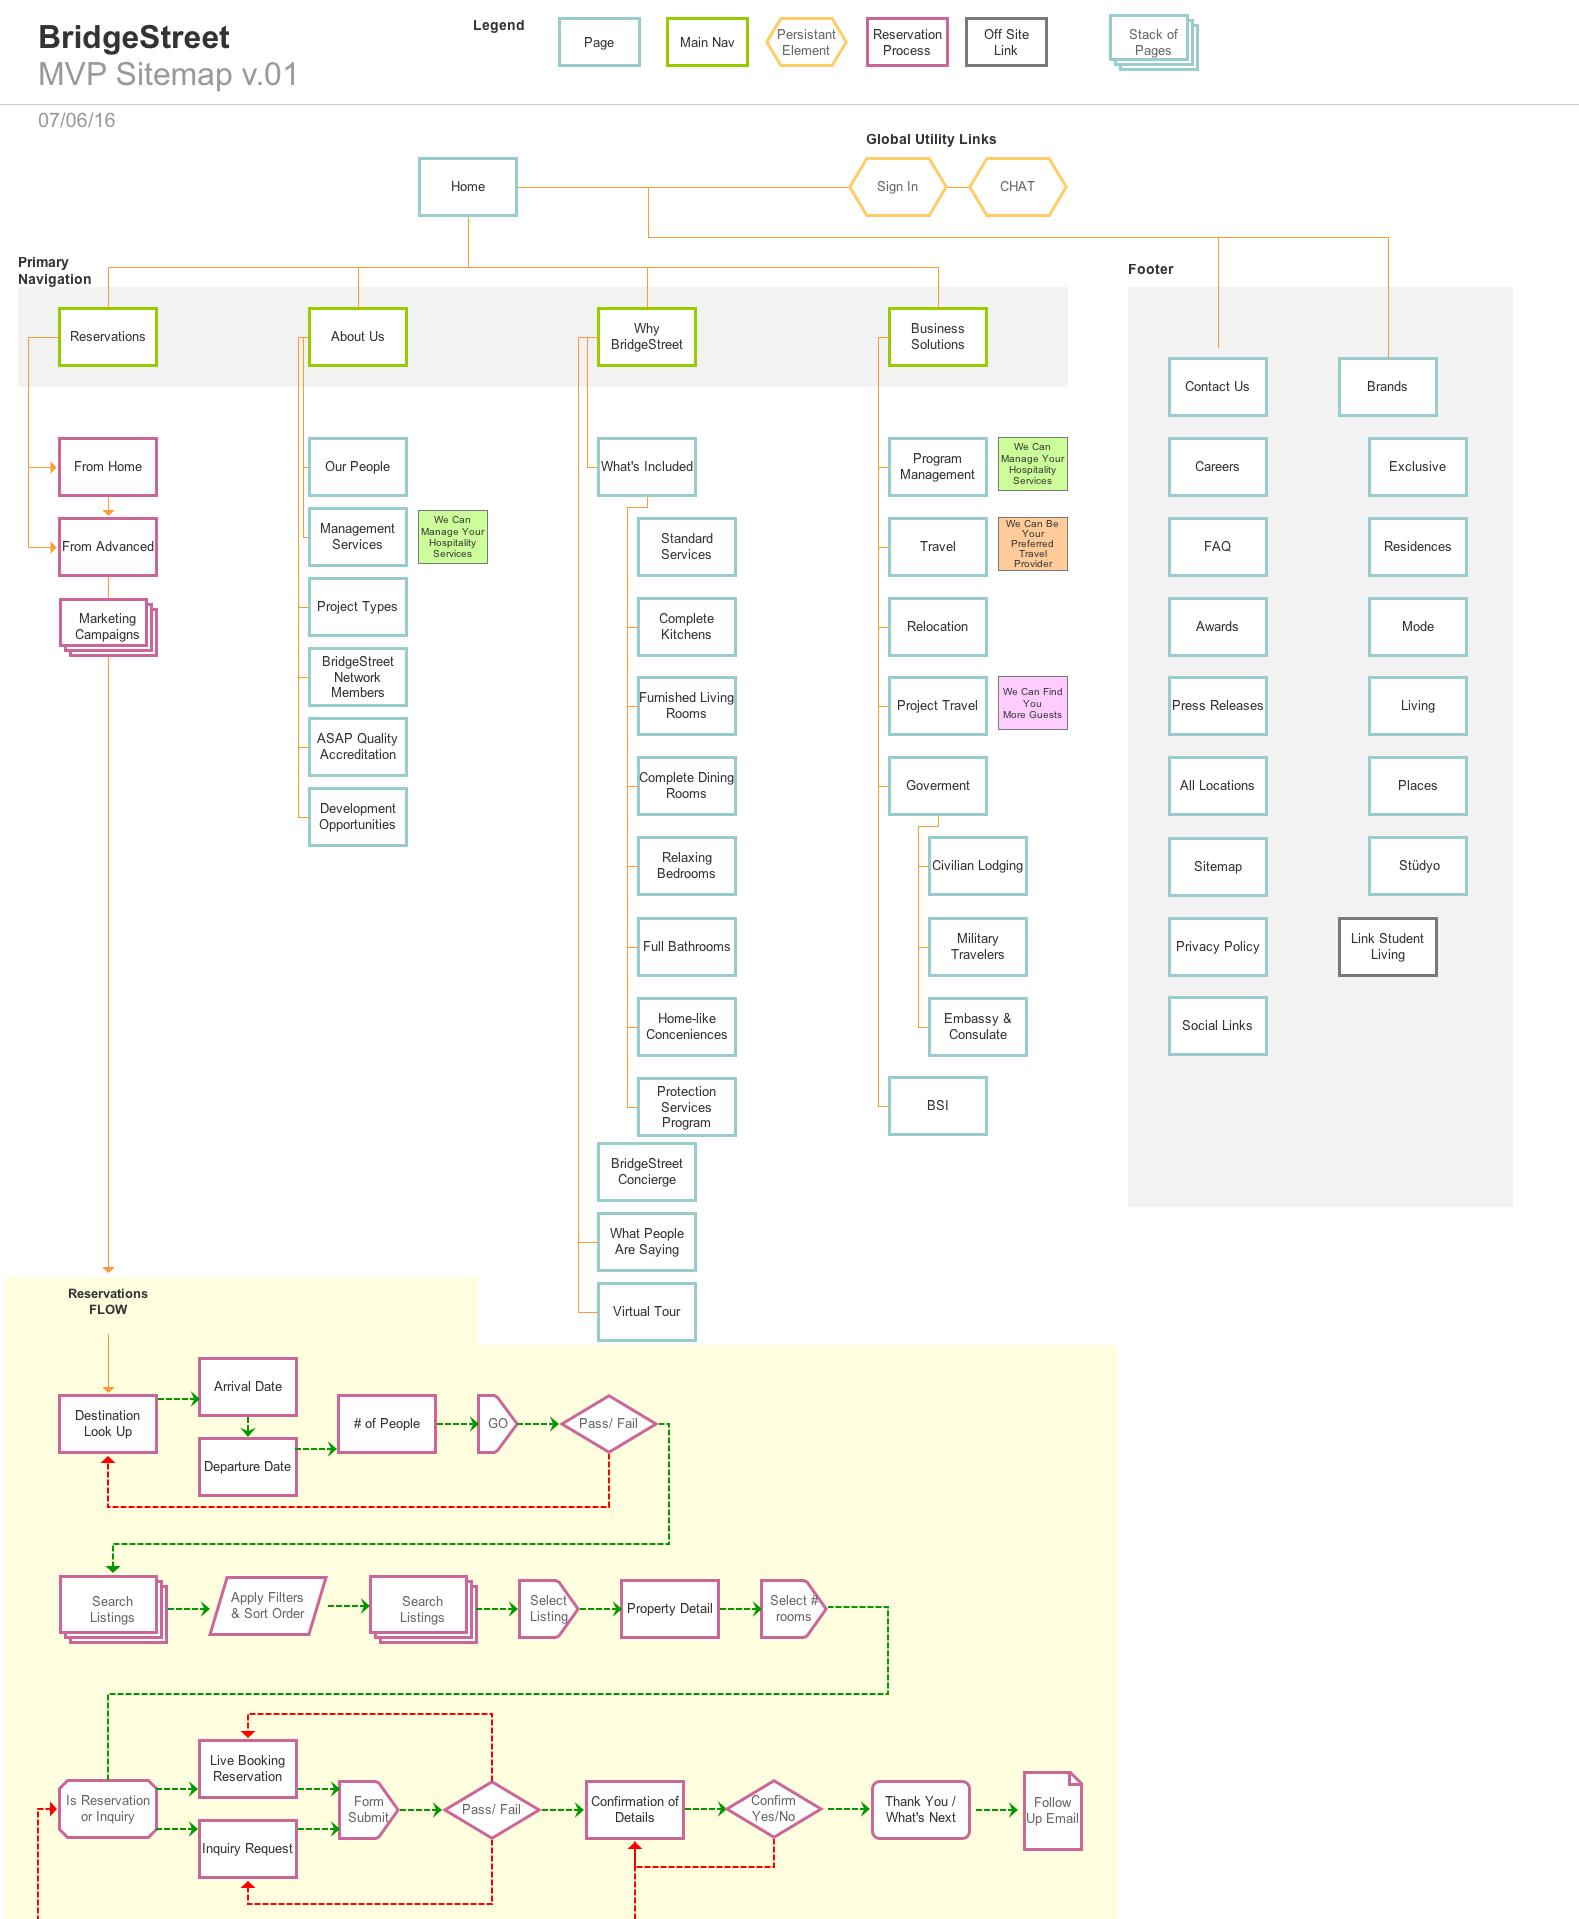 sitemap_edit.png